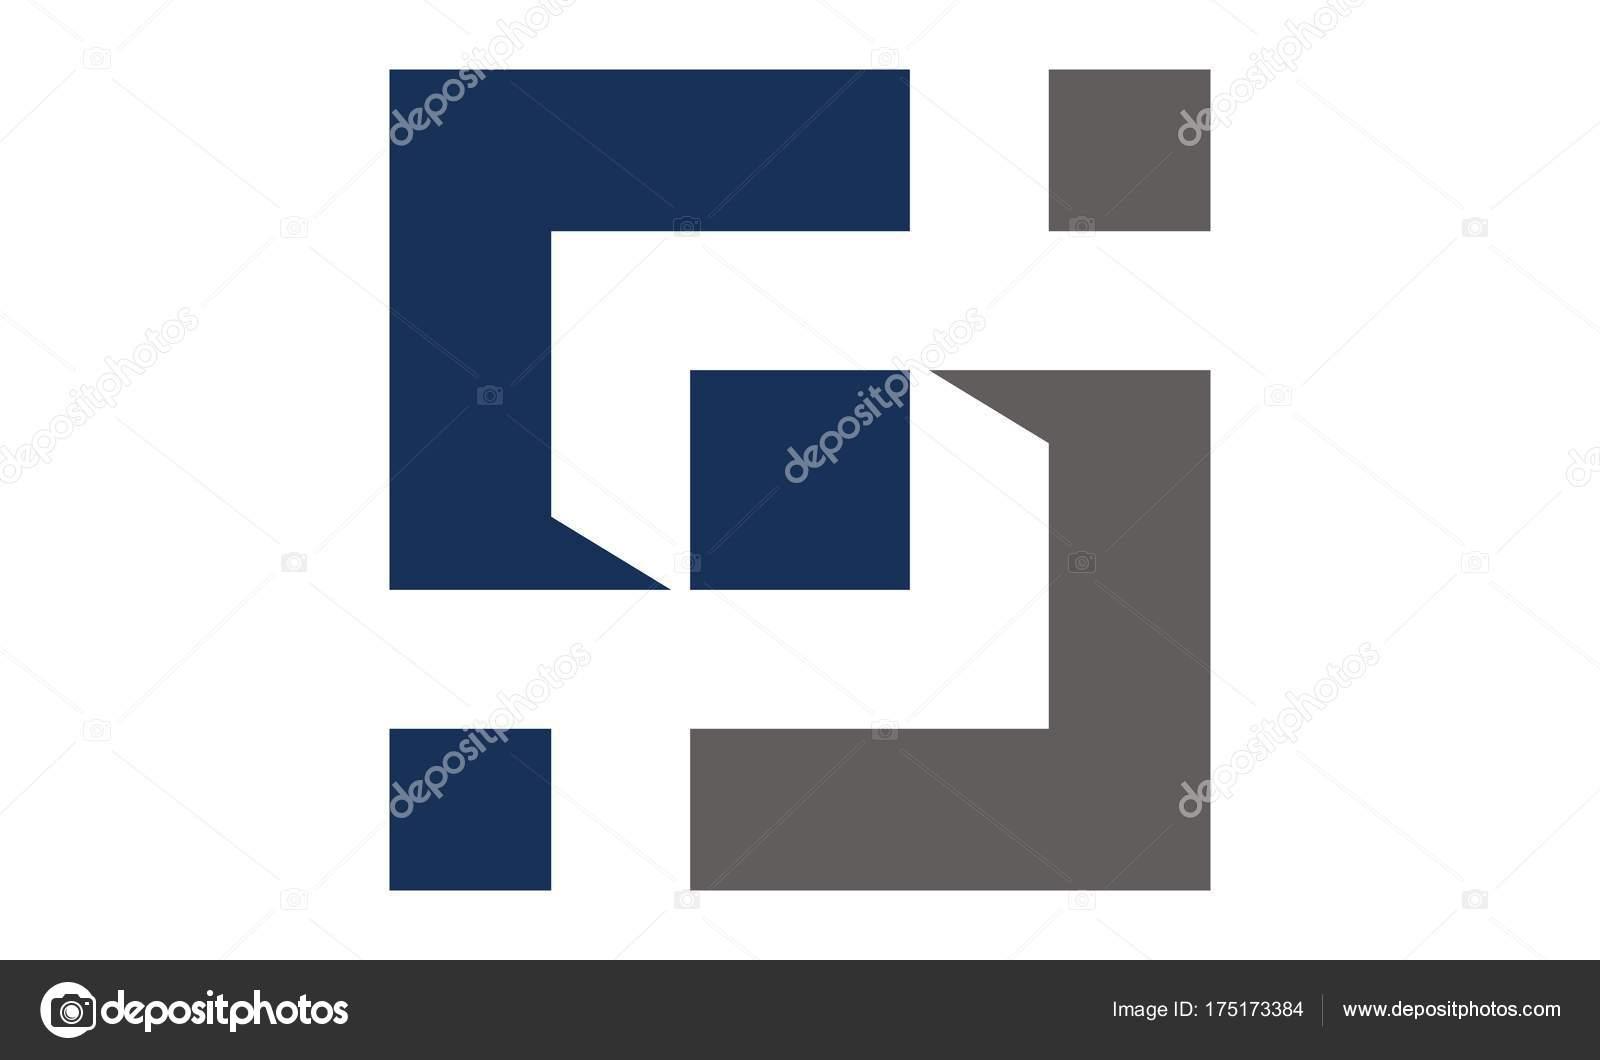 Letter ps logo design template vector stock vector alluranet letter ps logo design template vector stock vector buycottarizona